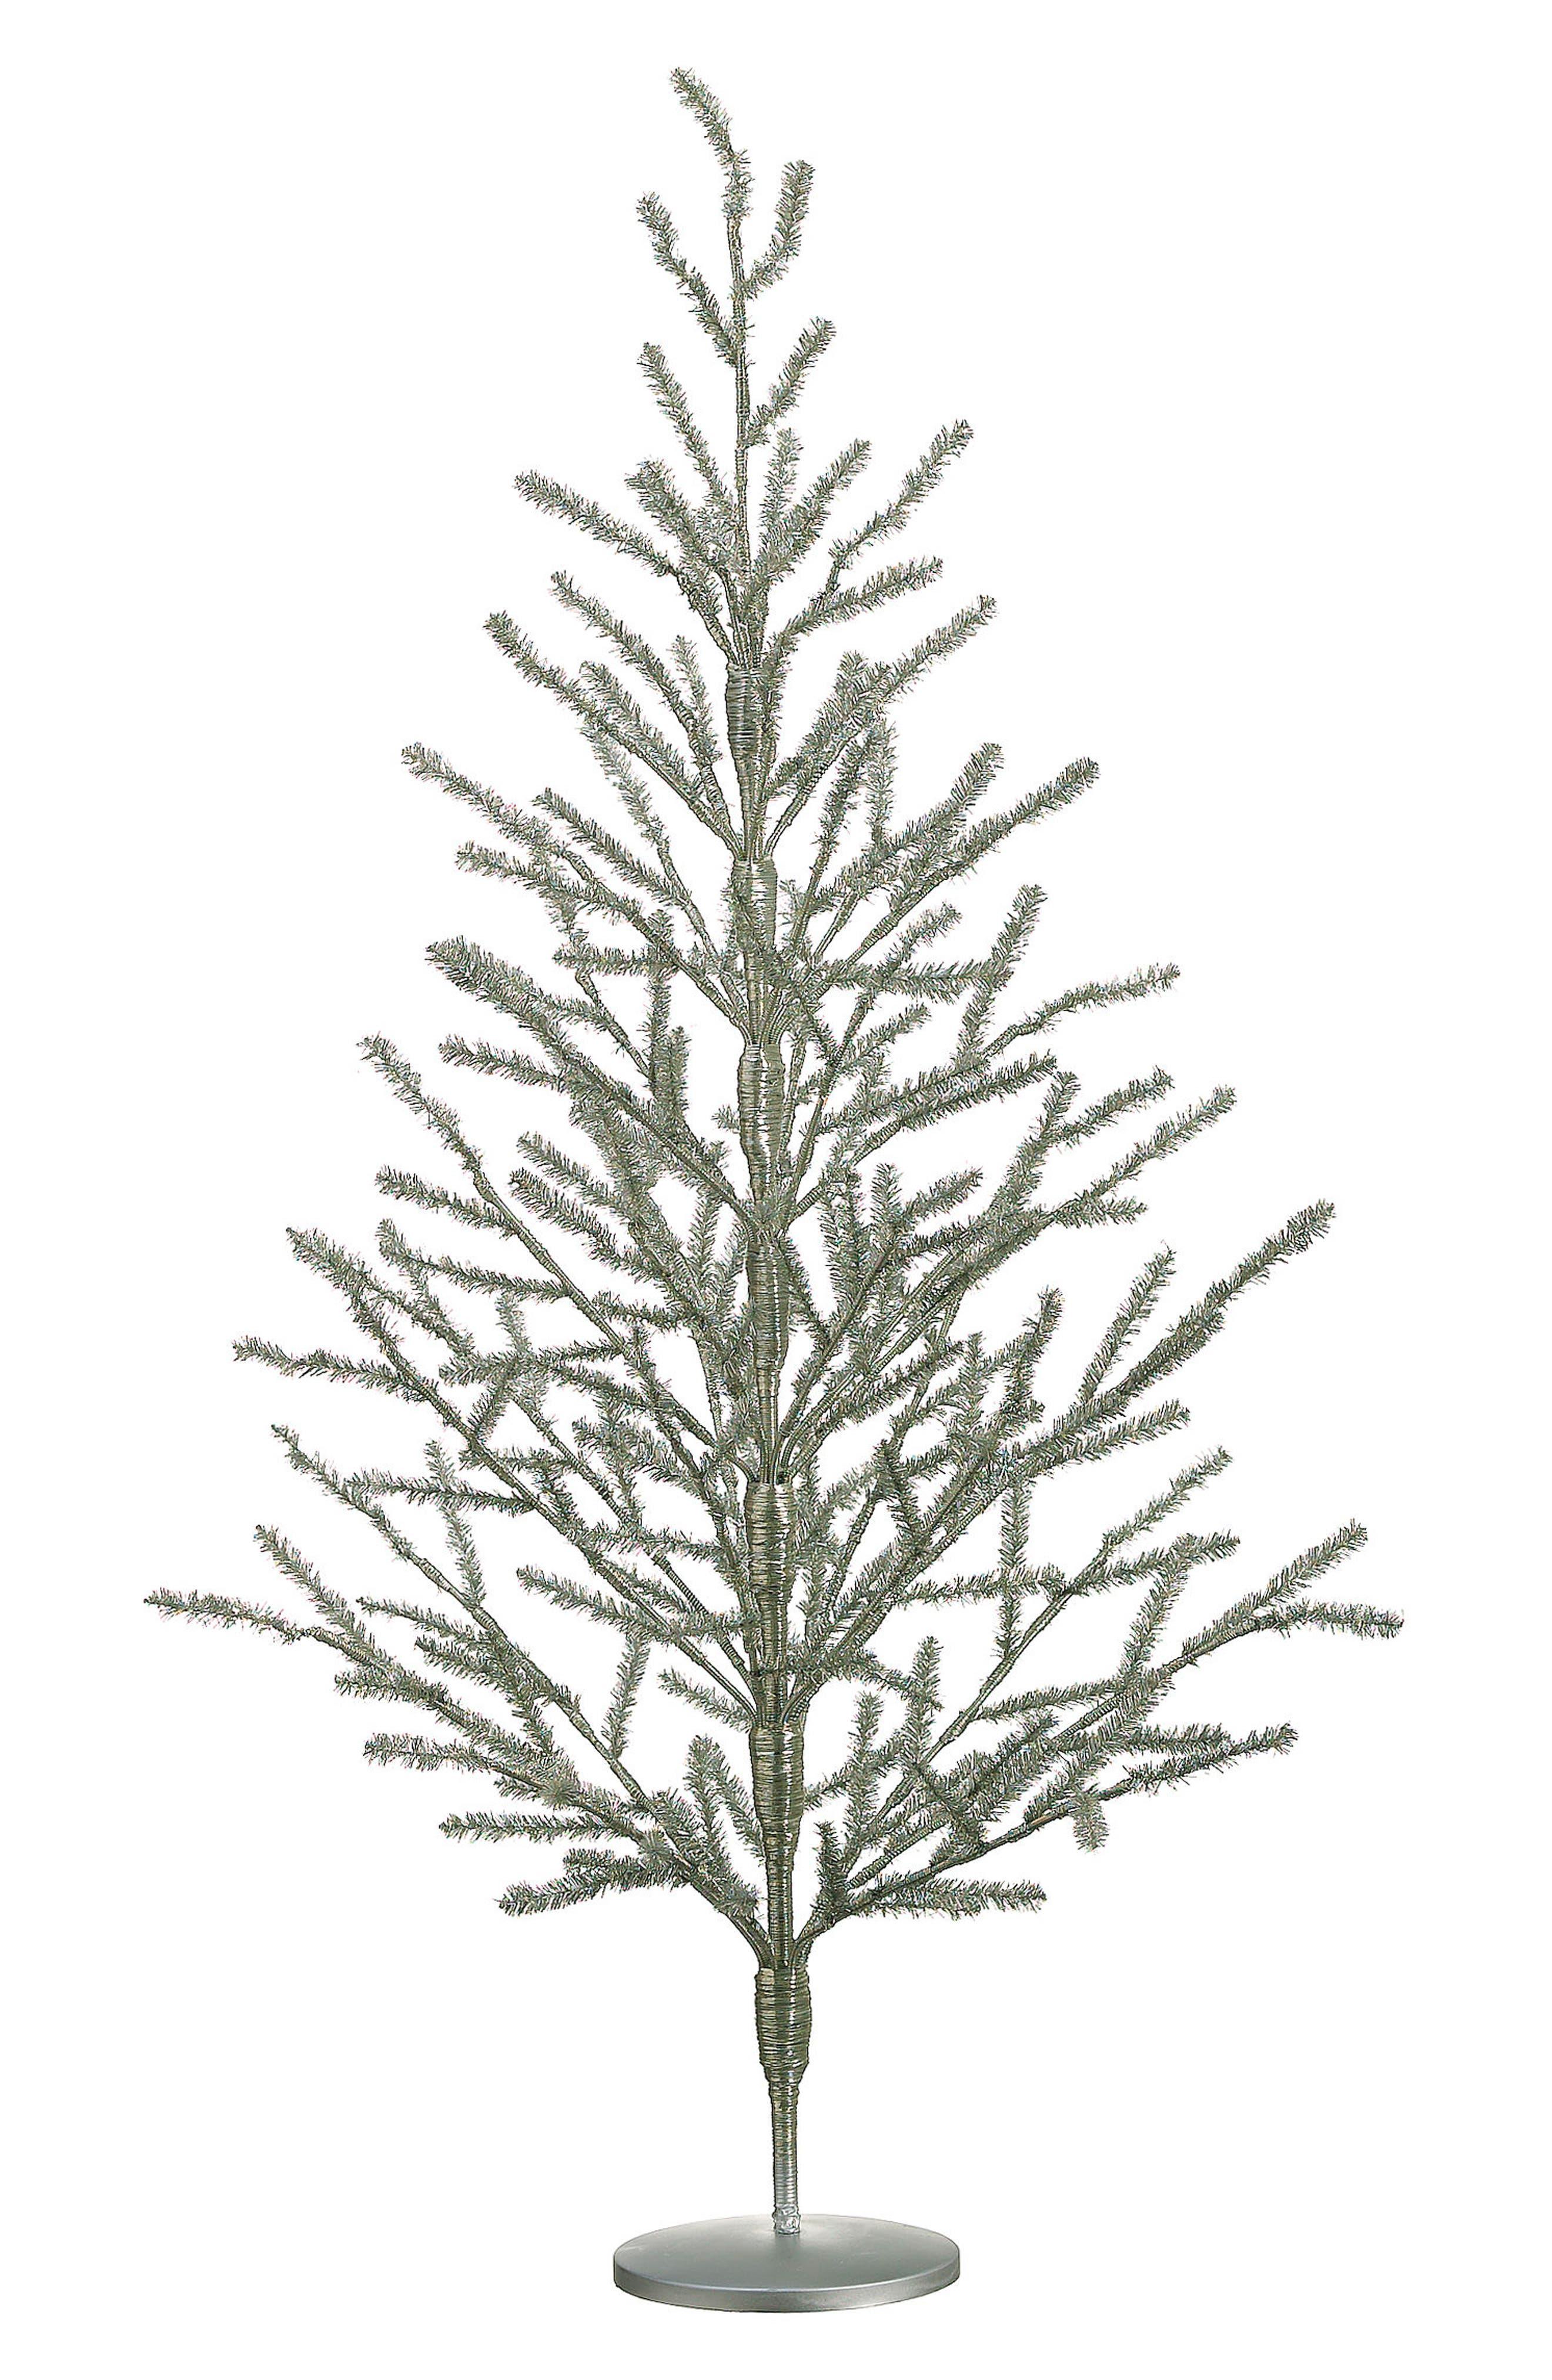 Alternate Image 1 Selected - ALLSTATE Tinsel Tree